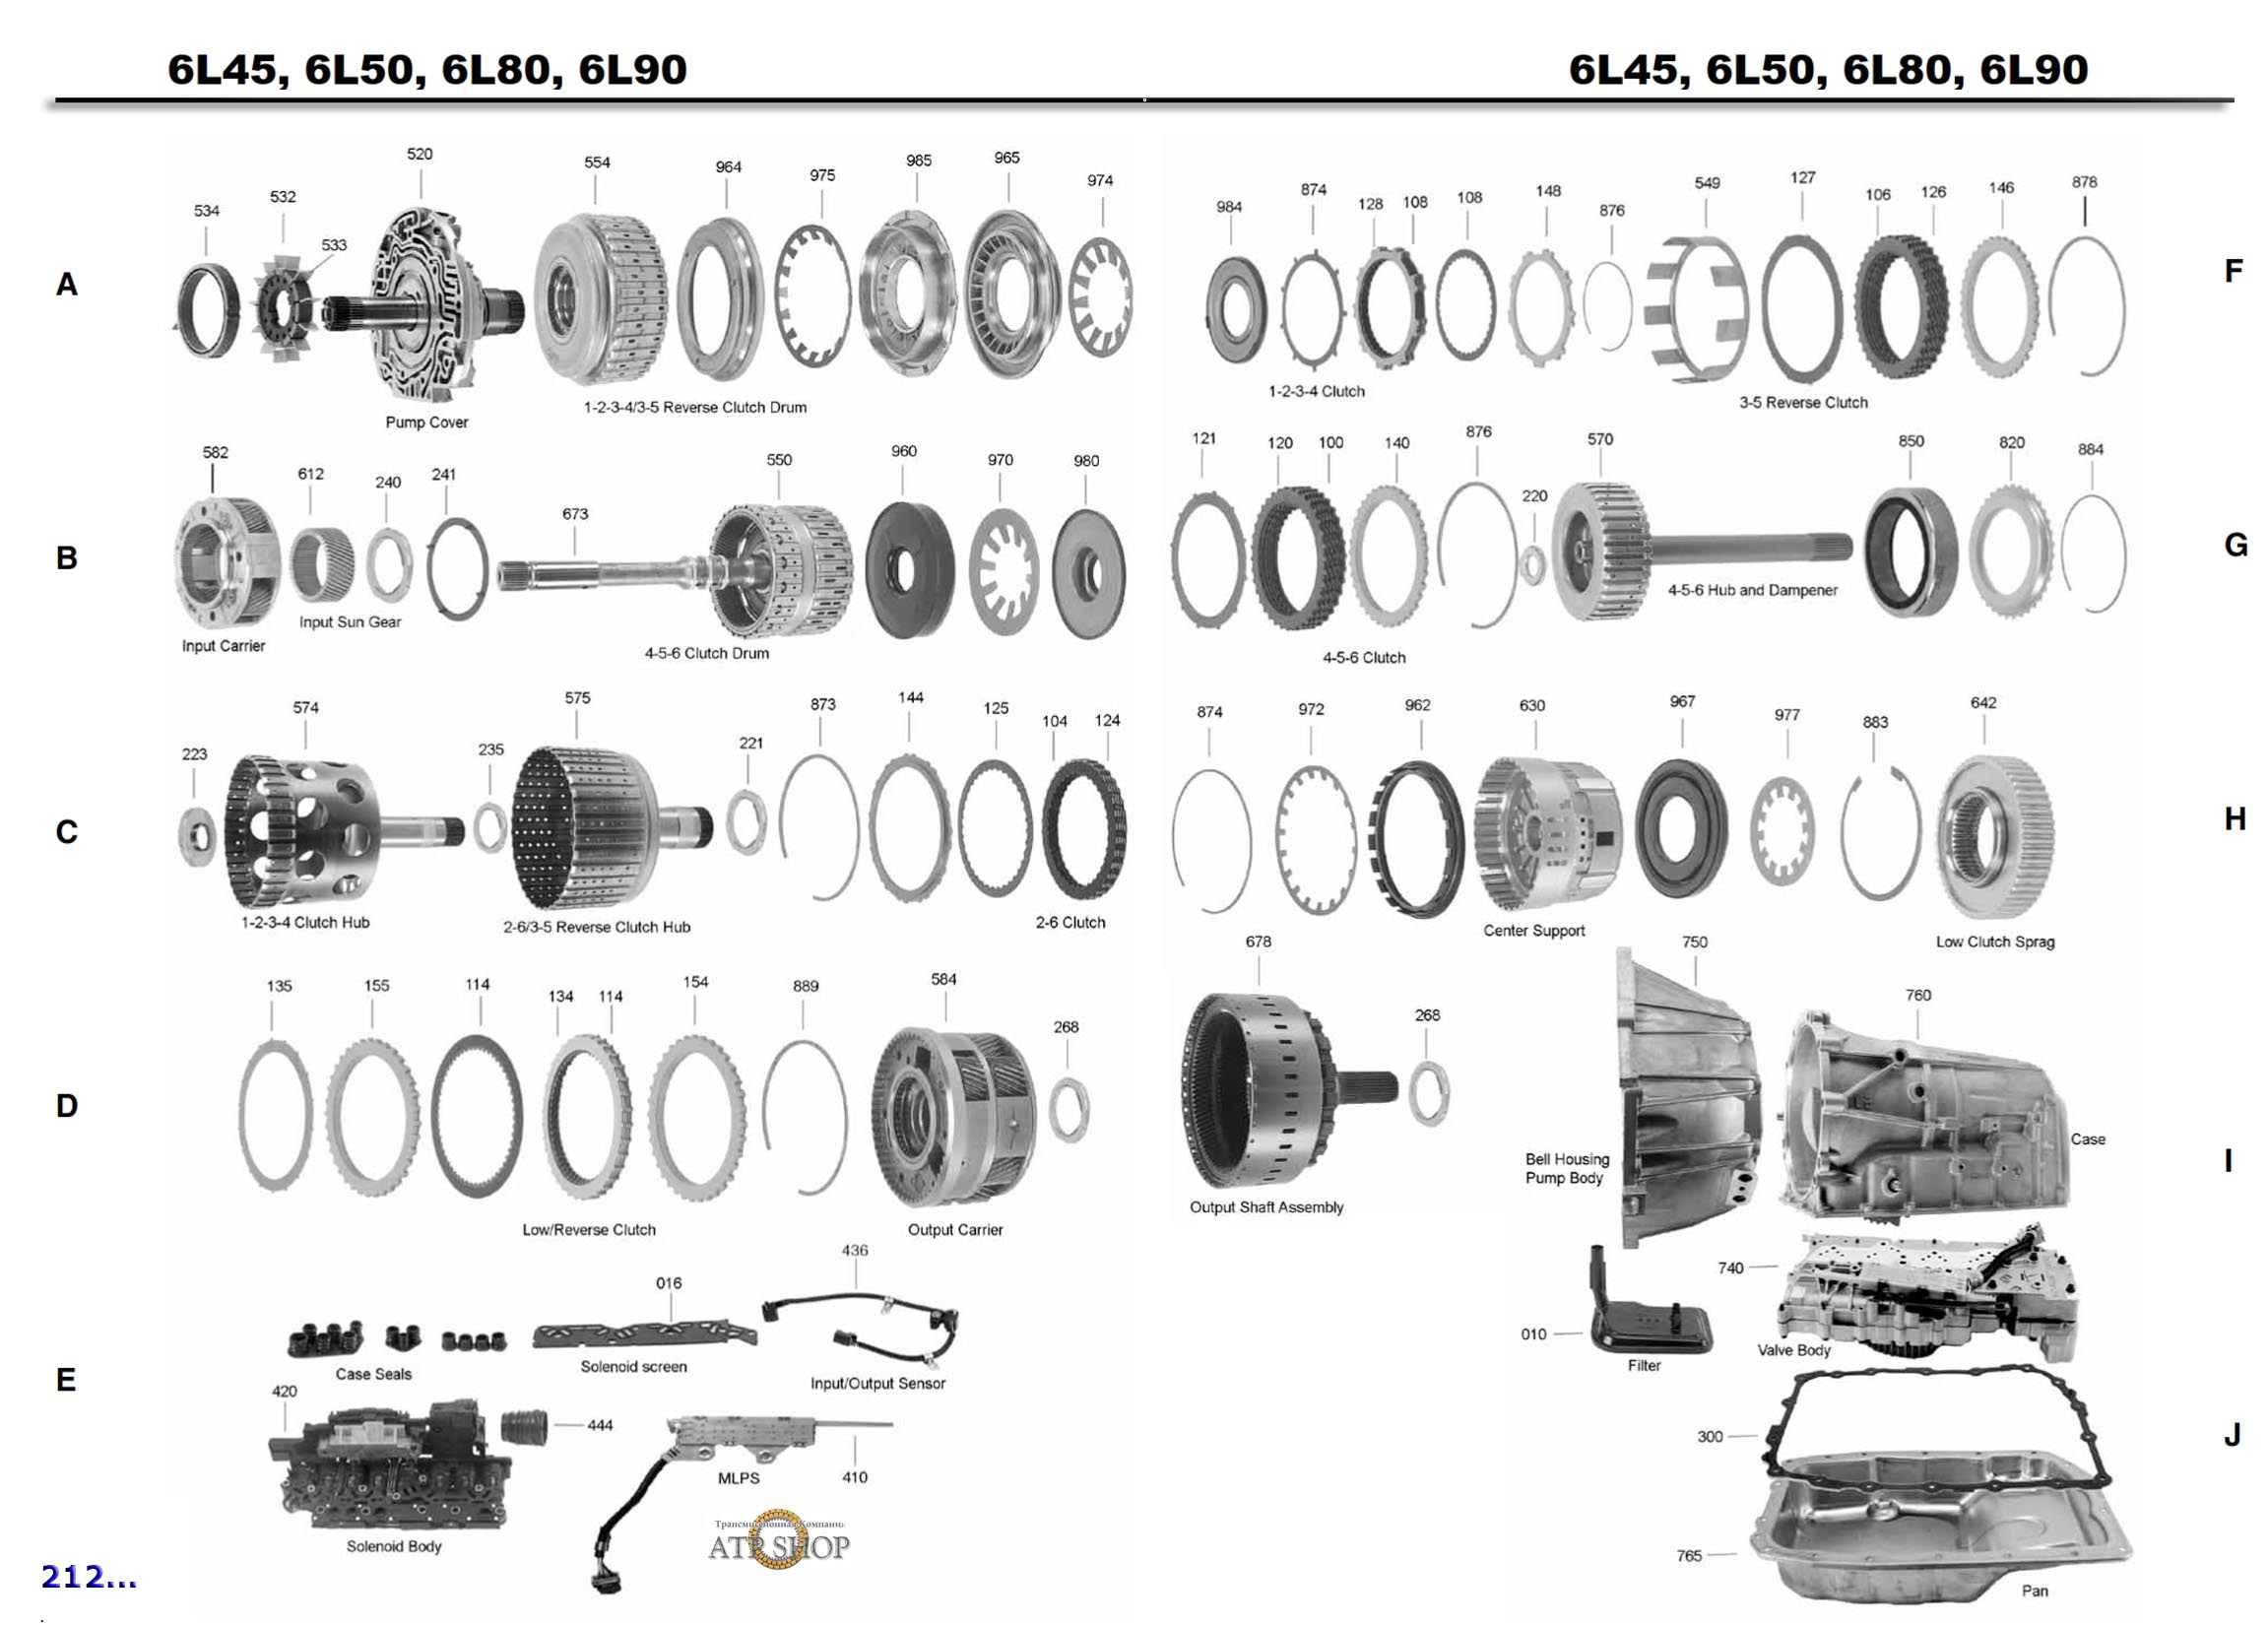 6L45E, 6L50, Описание, Цены, Каталог деталей.